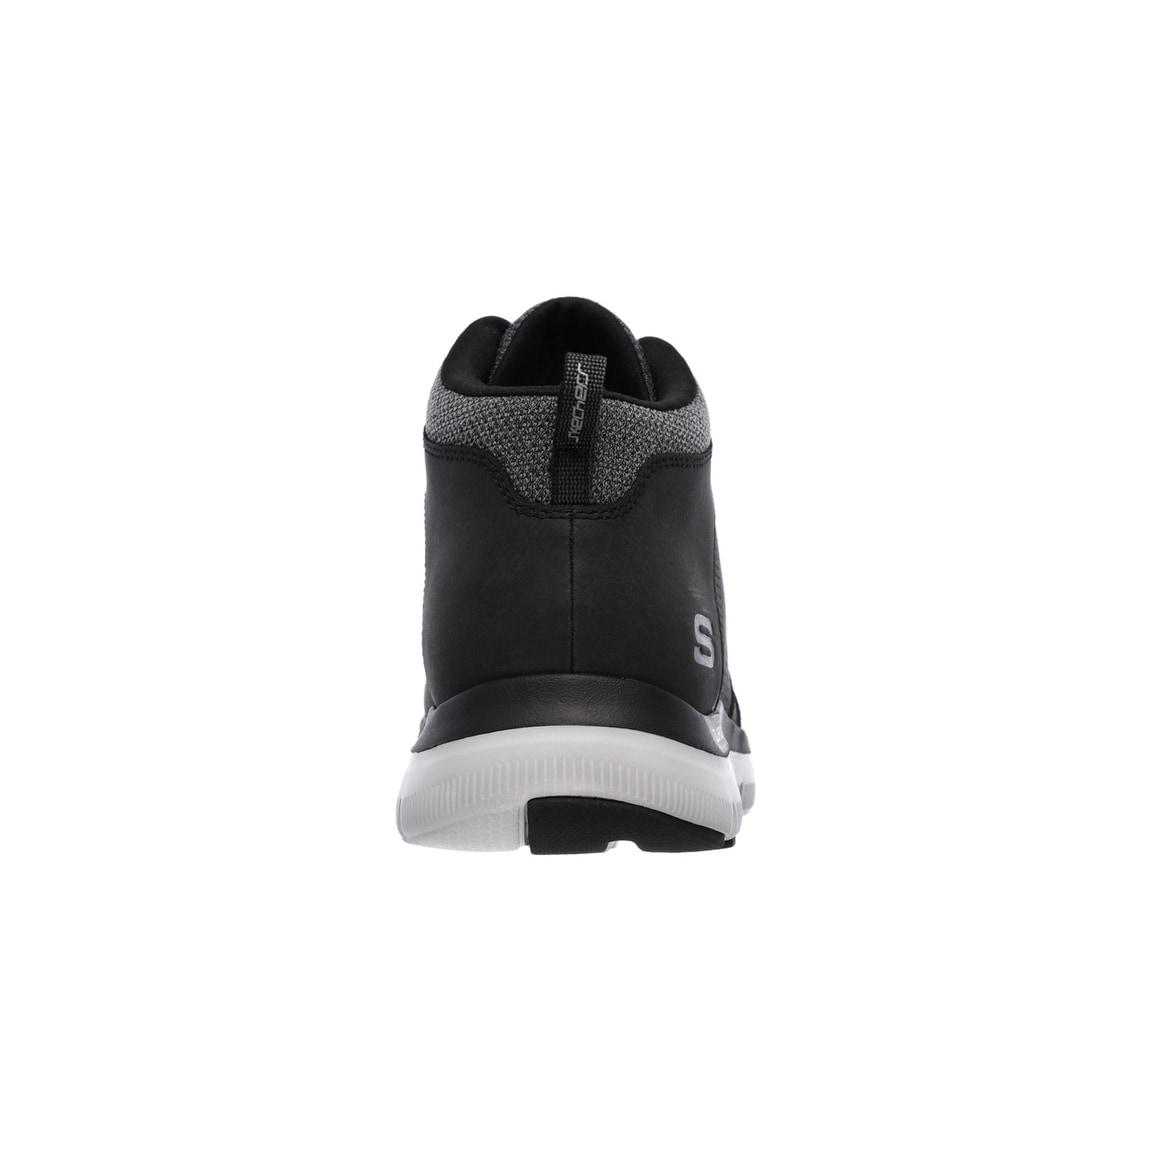 Shop Skechers 52187 BLK Men s FLEX ADVANTAGE 2.0-HIGH-KEY Training - Ships  To Canada - - 14436806 5165c95a8